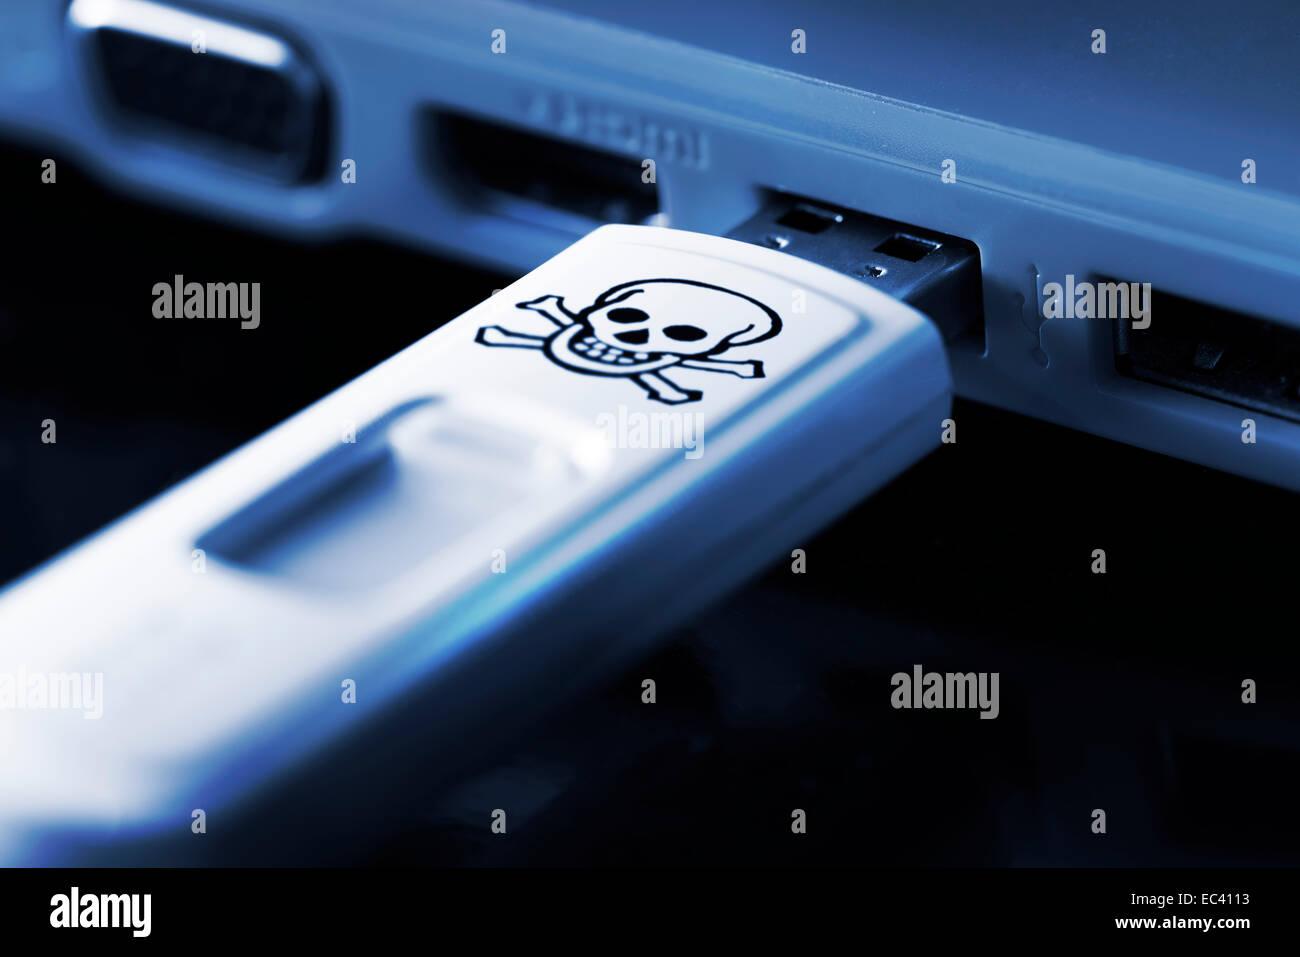 Skull sign on USB flash drive, computer virus - Stock Image